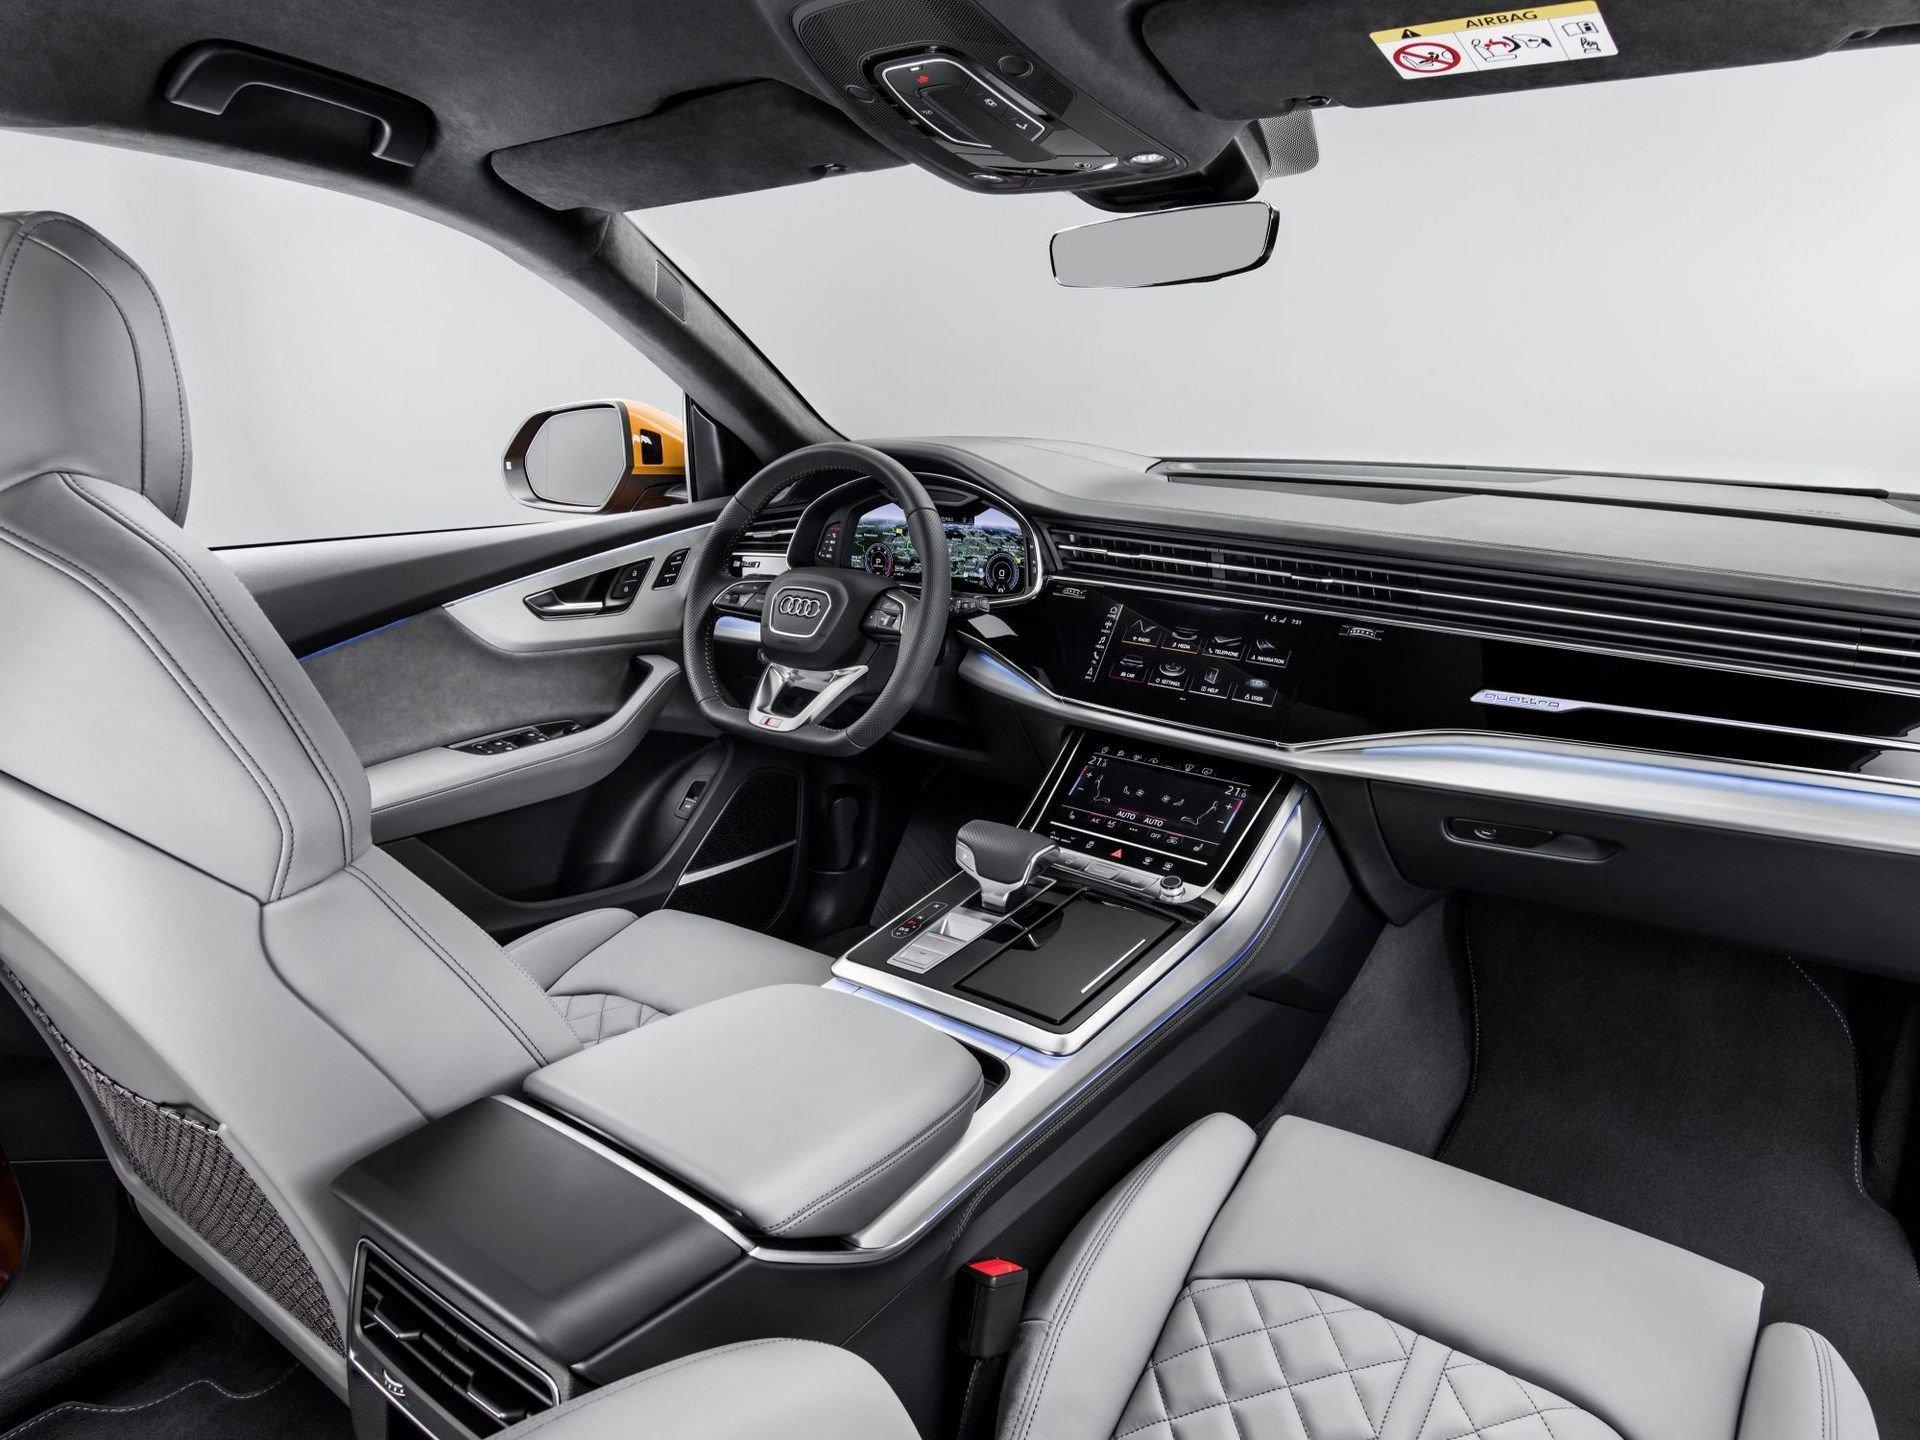 Audi Q8 2018 First Photos (13)